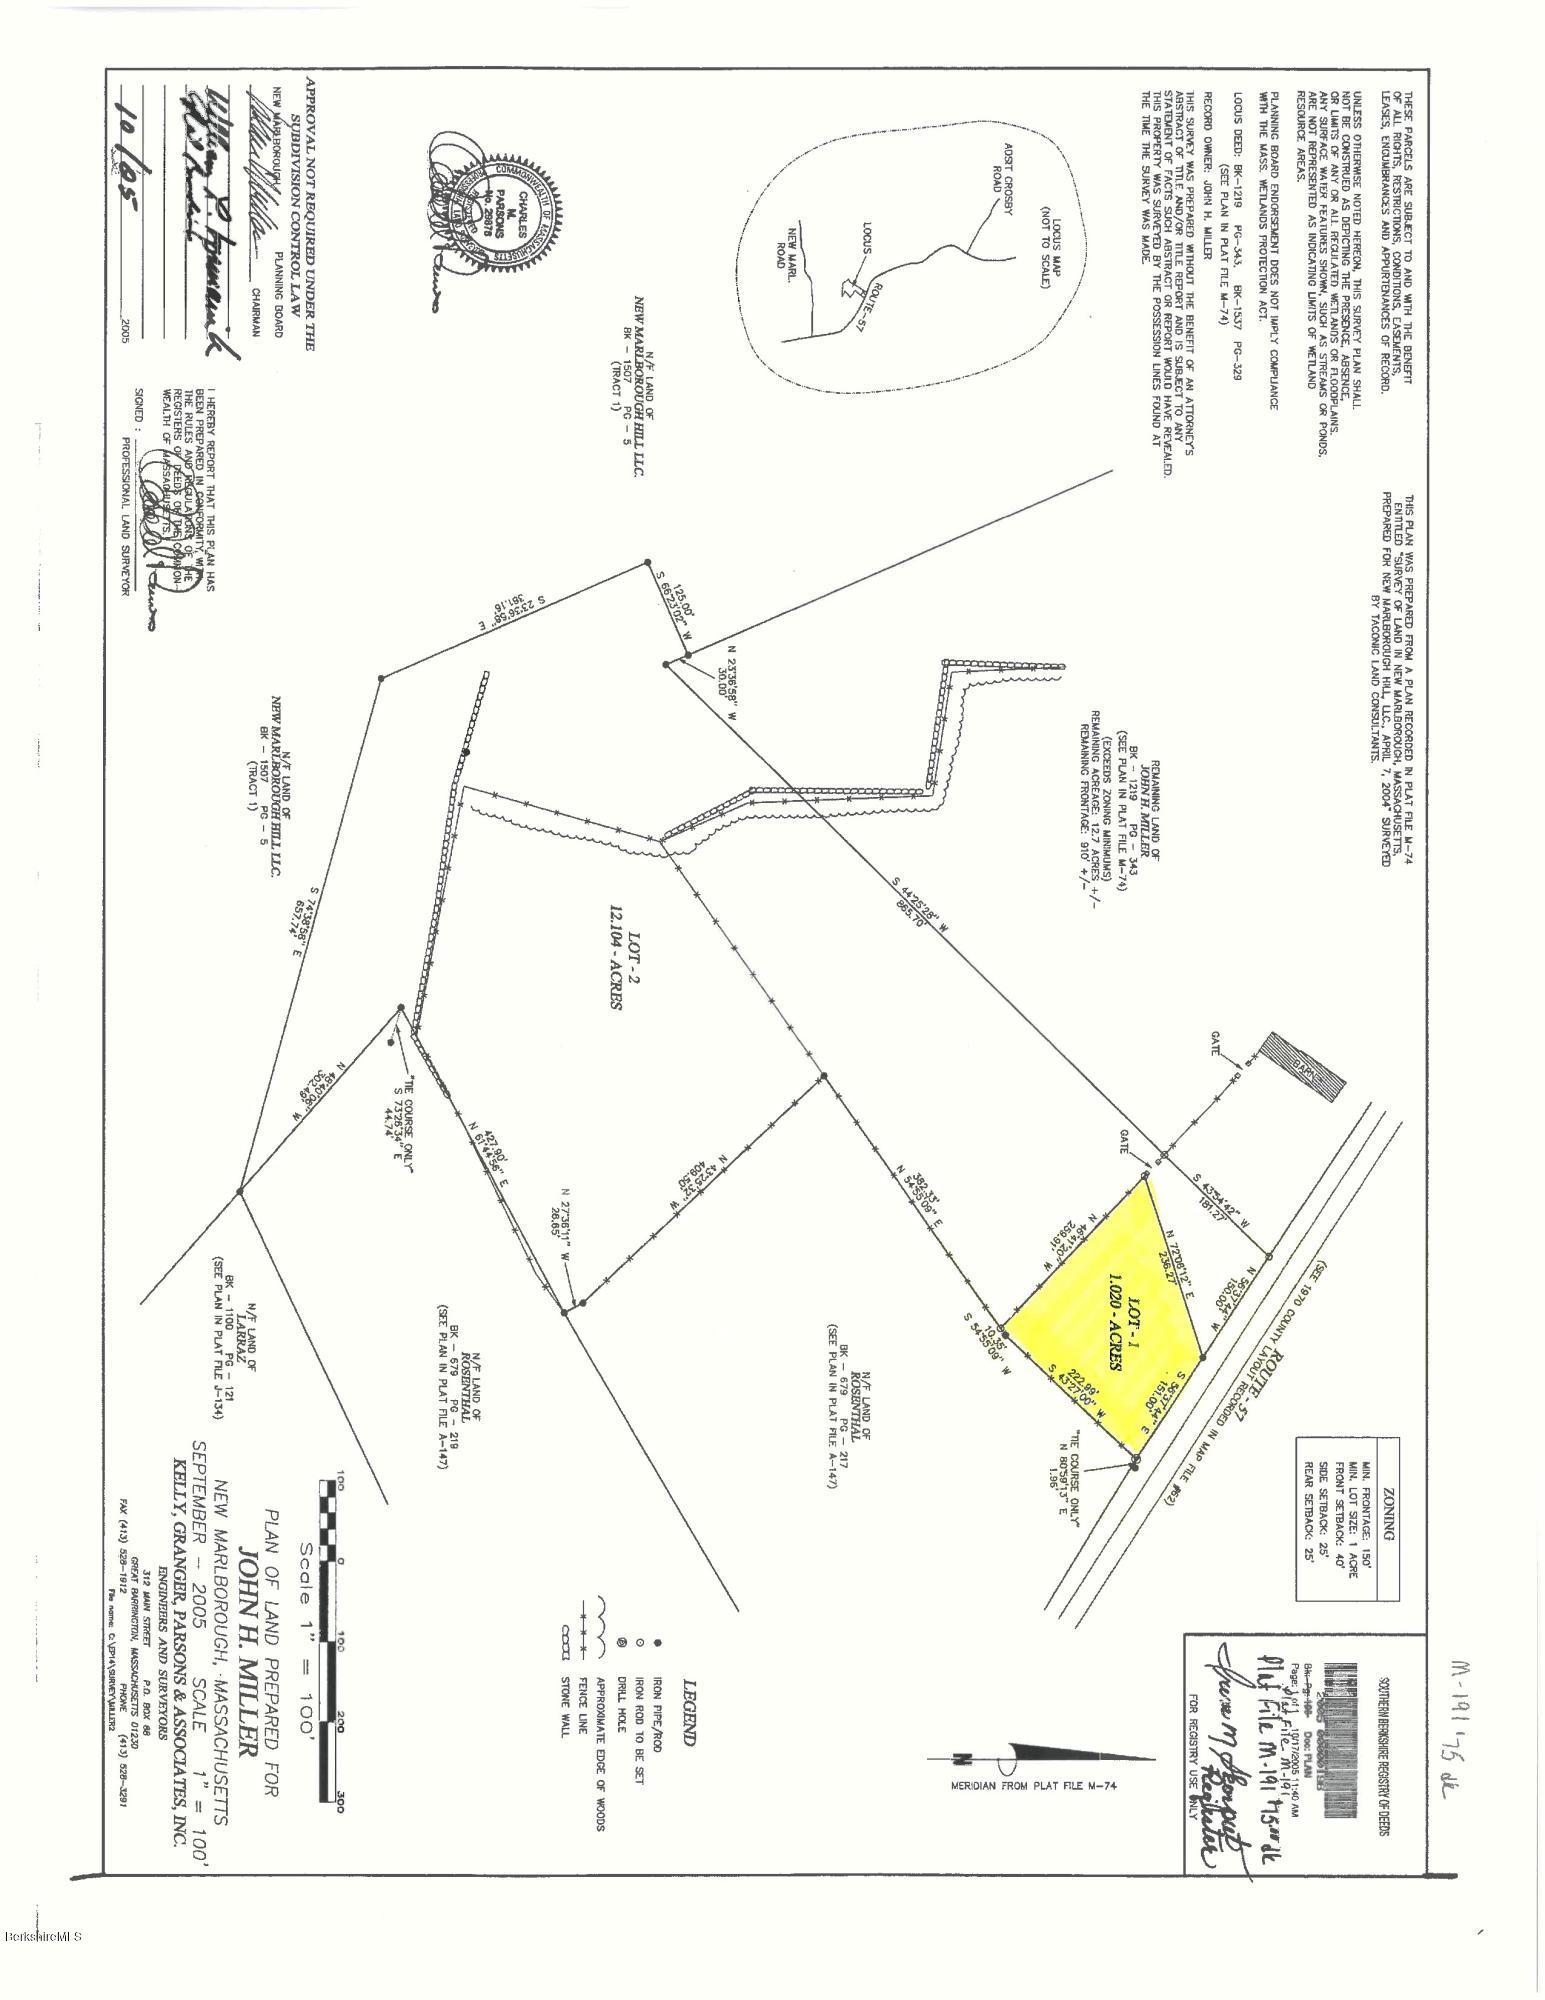 Route 57 New Marlborough MA 01259